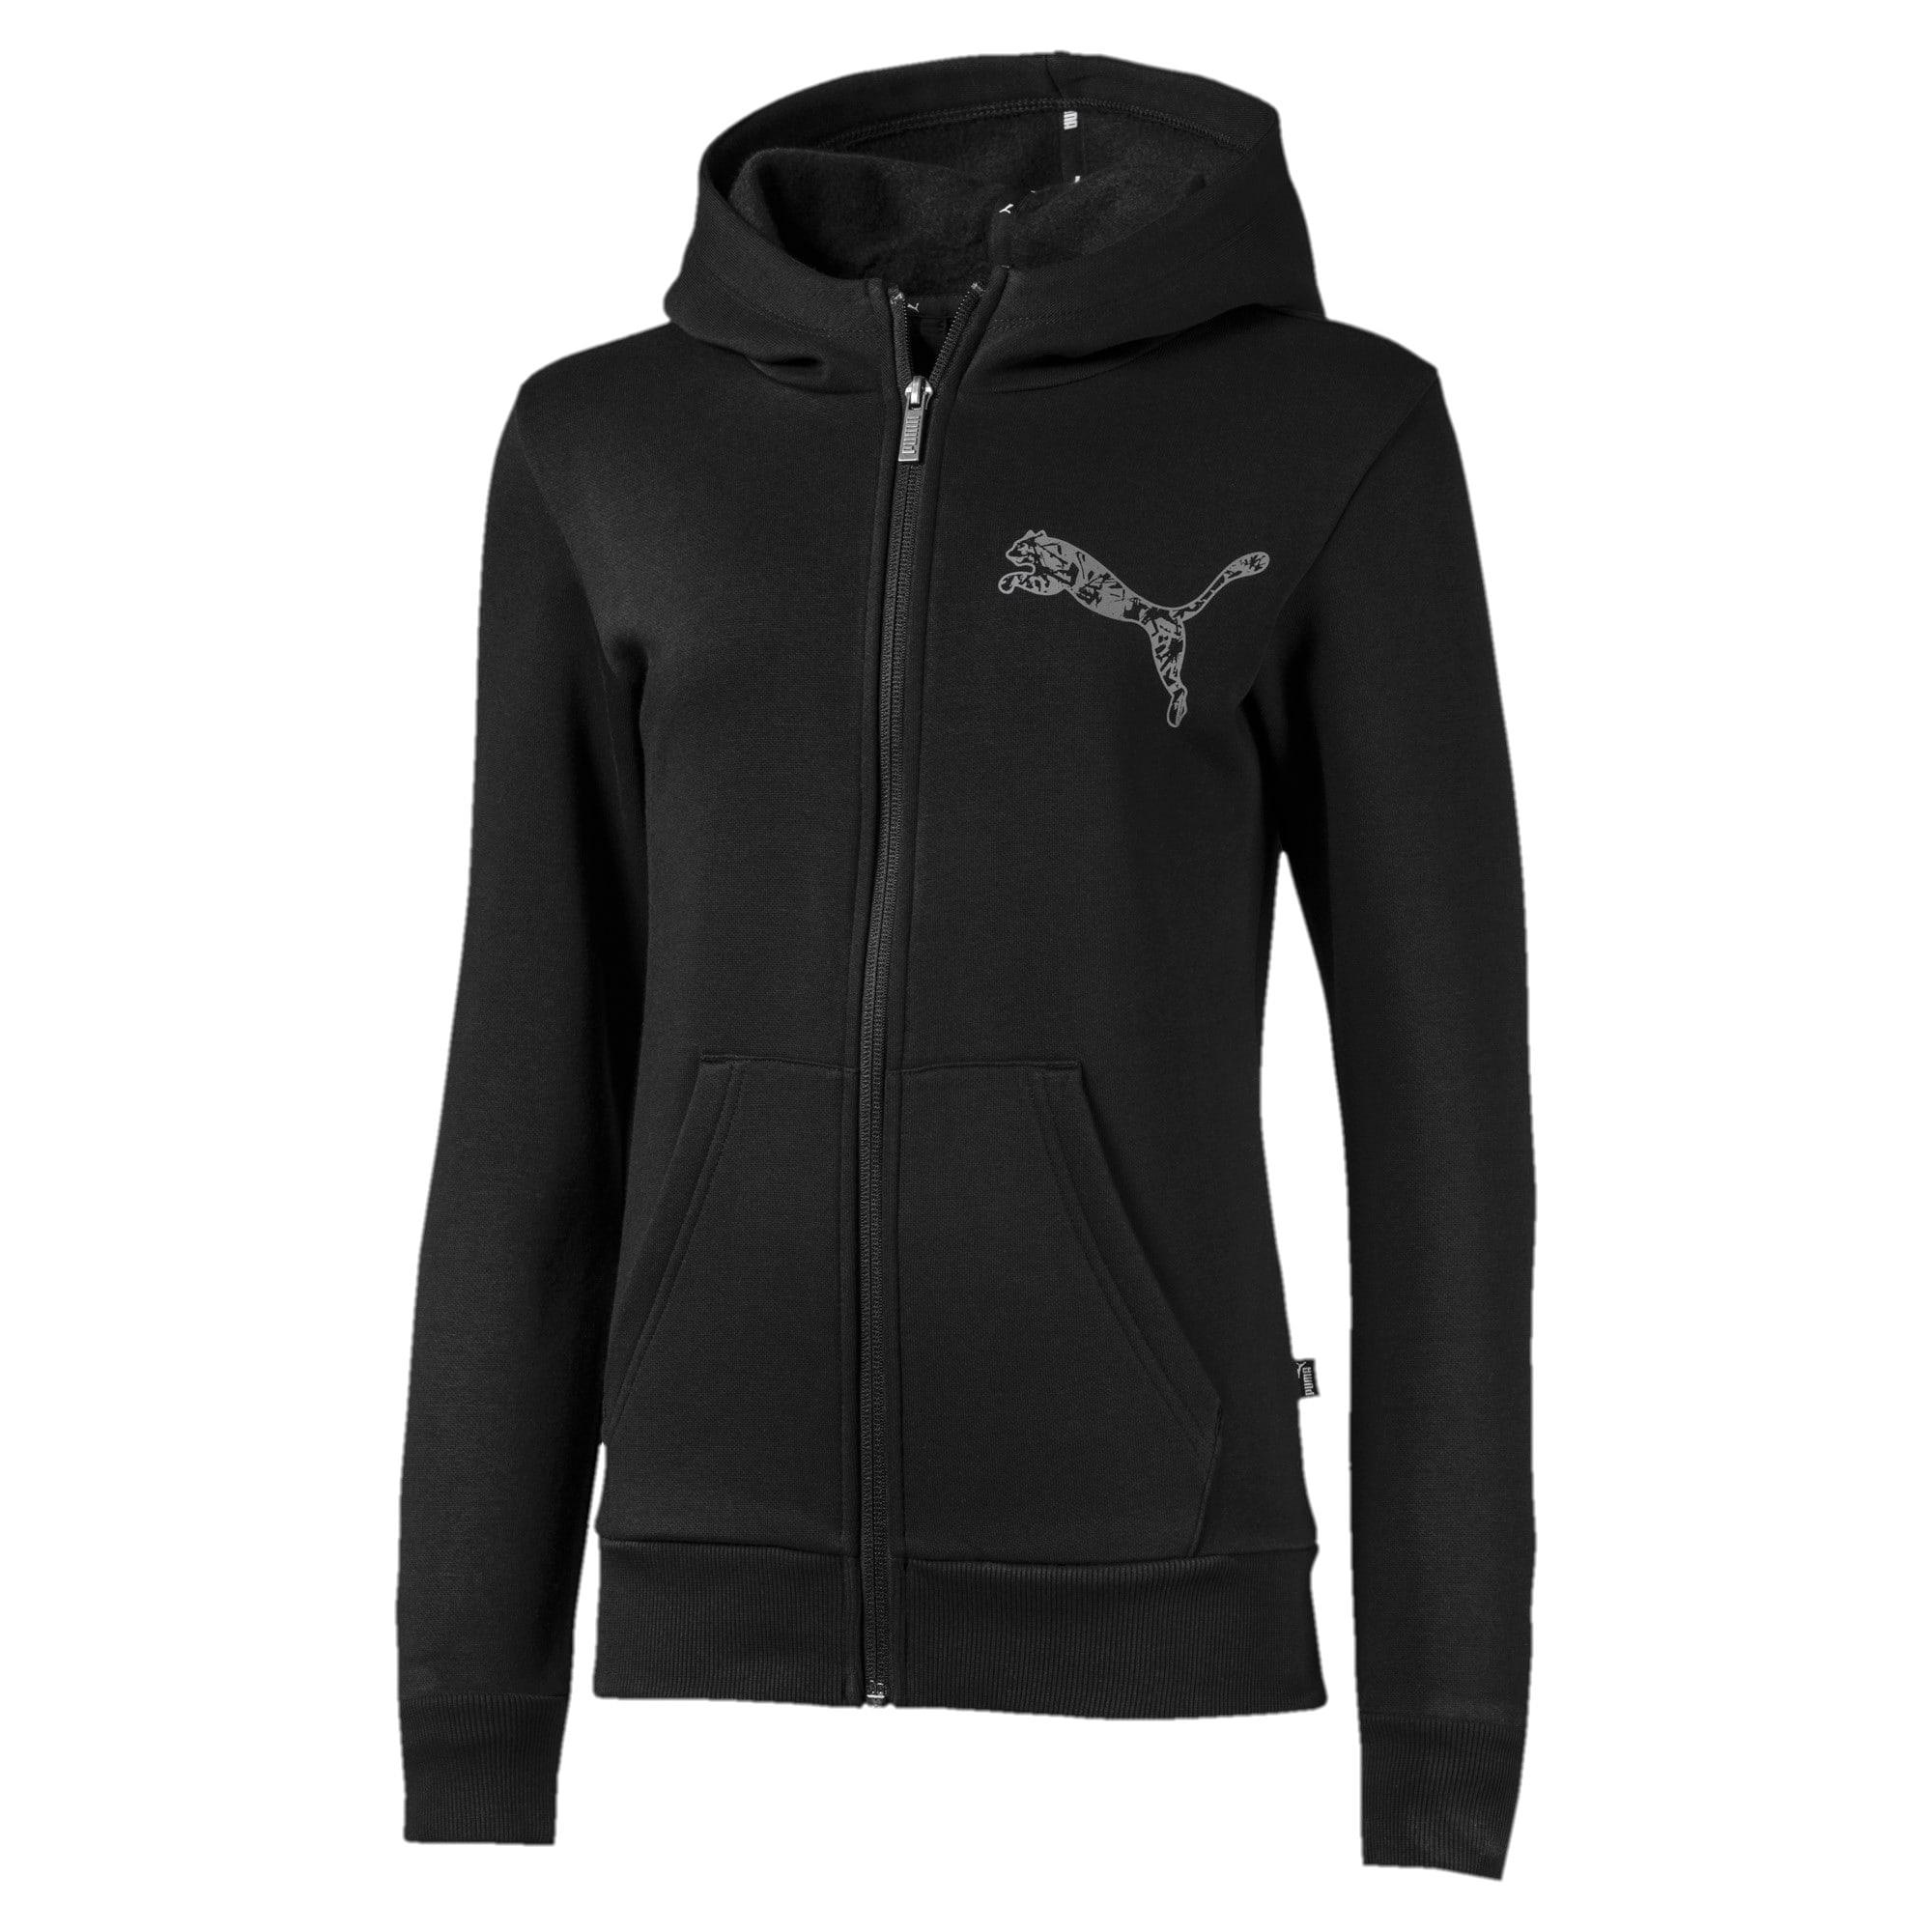 Thumbnail 1 of Full Zip Girls' Jacket, Puma Black, medium-IND